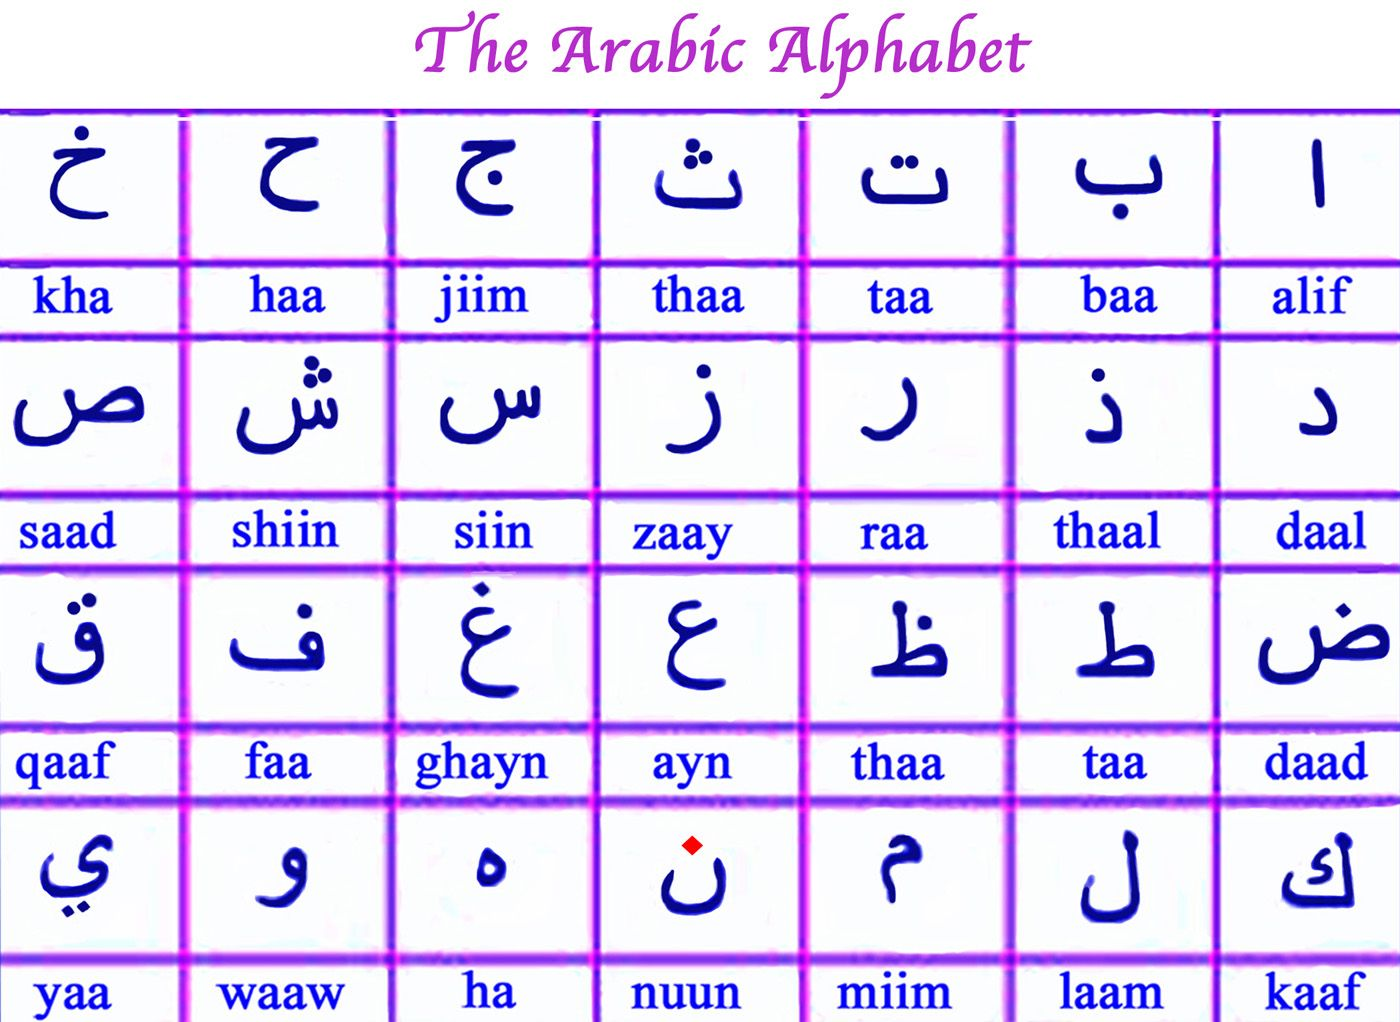 Arabic Alphabet Arabic Alphabet Learn Arabic Alphabet Alphabet Practice Worksheets